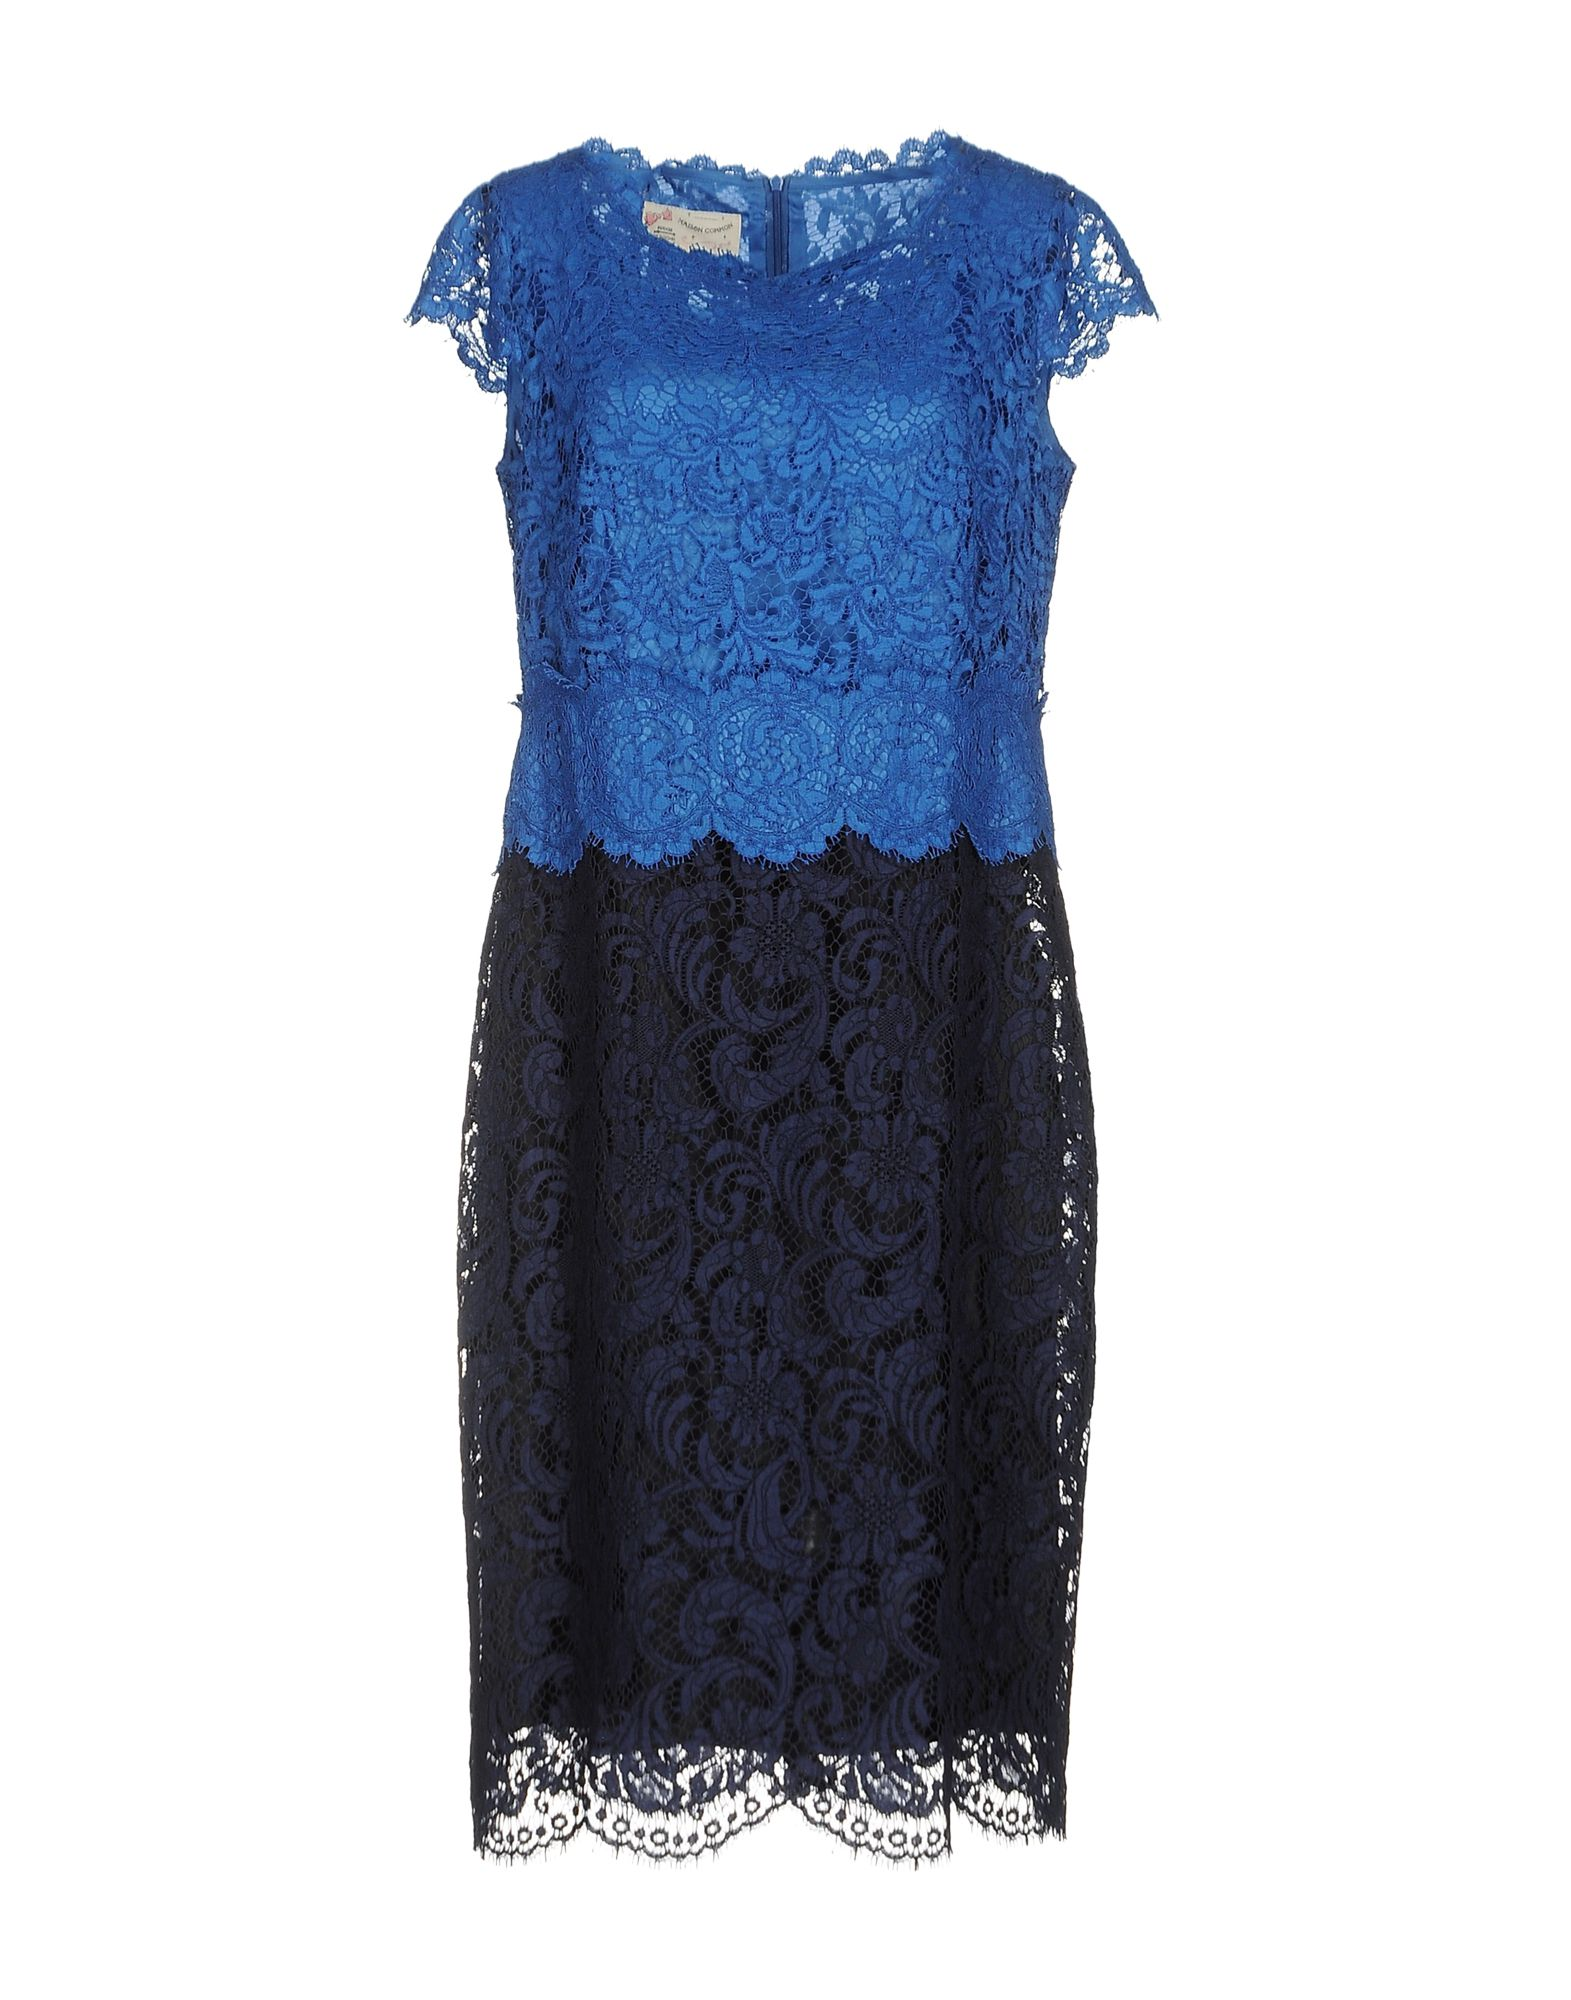 MAISON COMMON Короткое платье купить common interface на самсунг